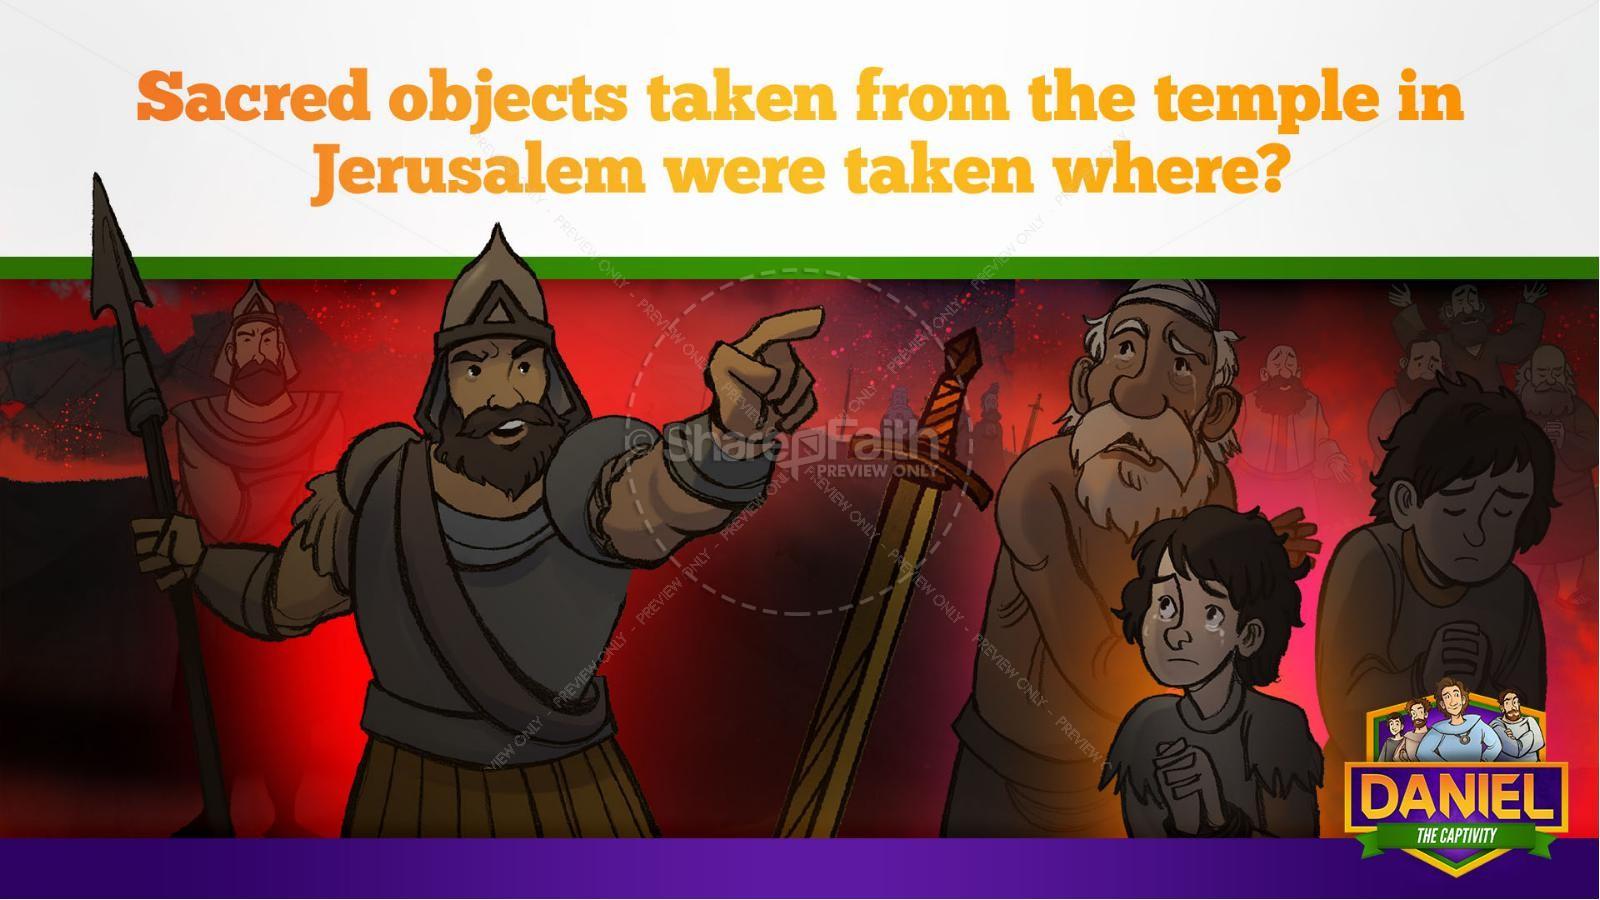 Daniel 1 The Captivity Kids Bible Story | slide 11